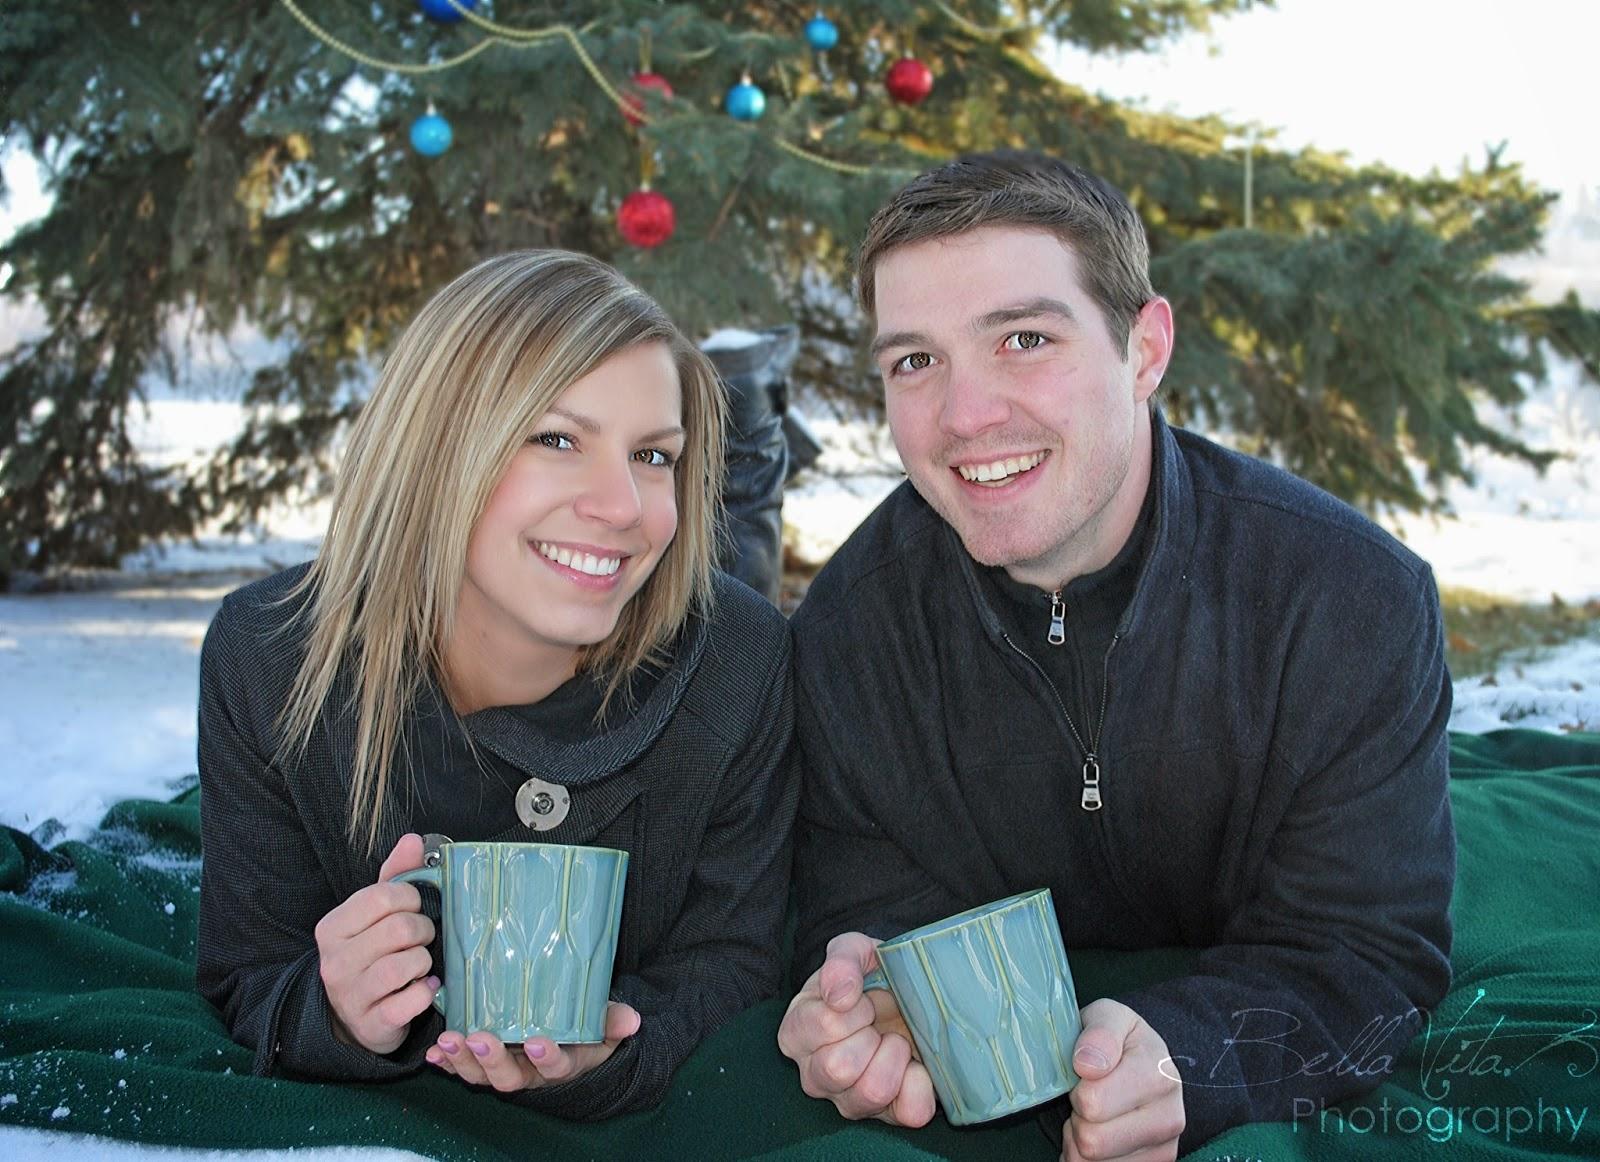 Bella Vita Photography: Kaelyn & Garrett, Christmas Photo\'s